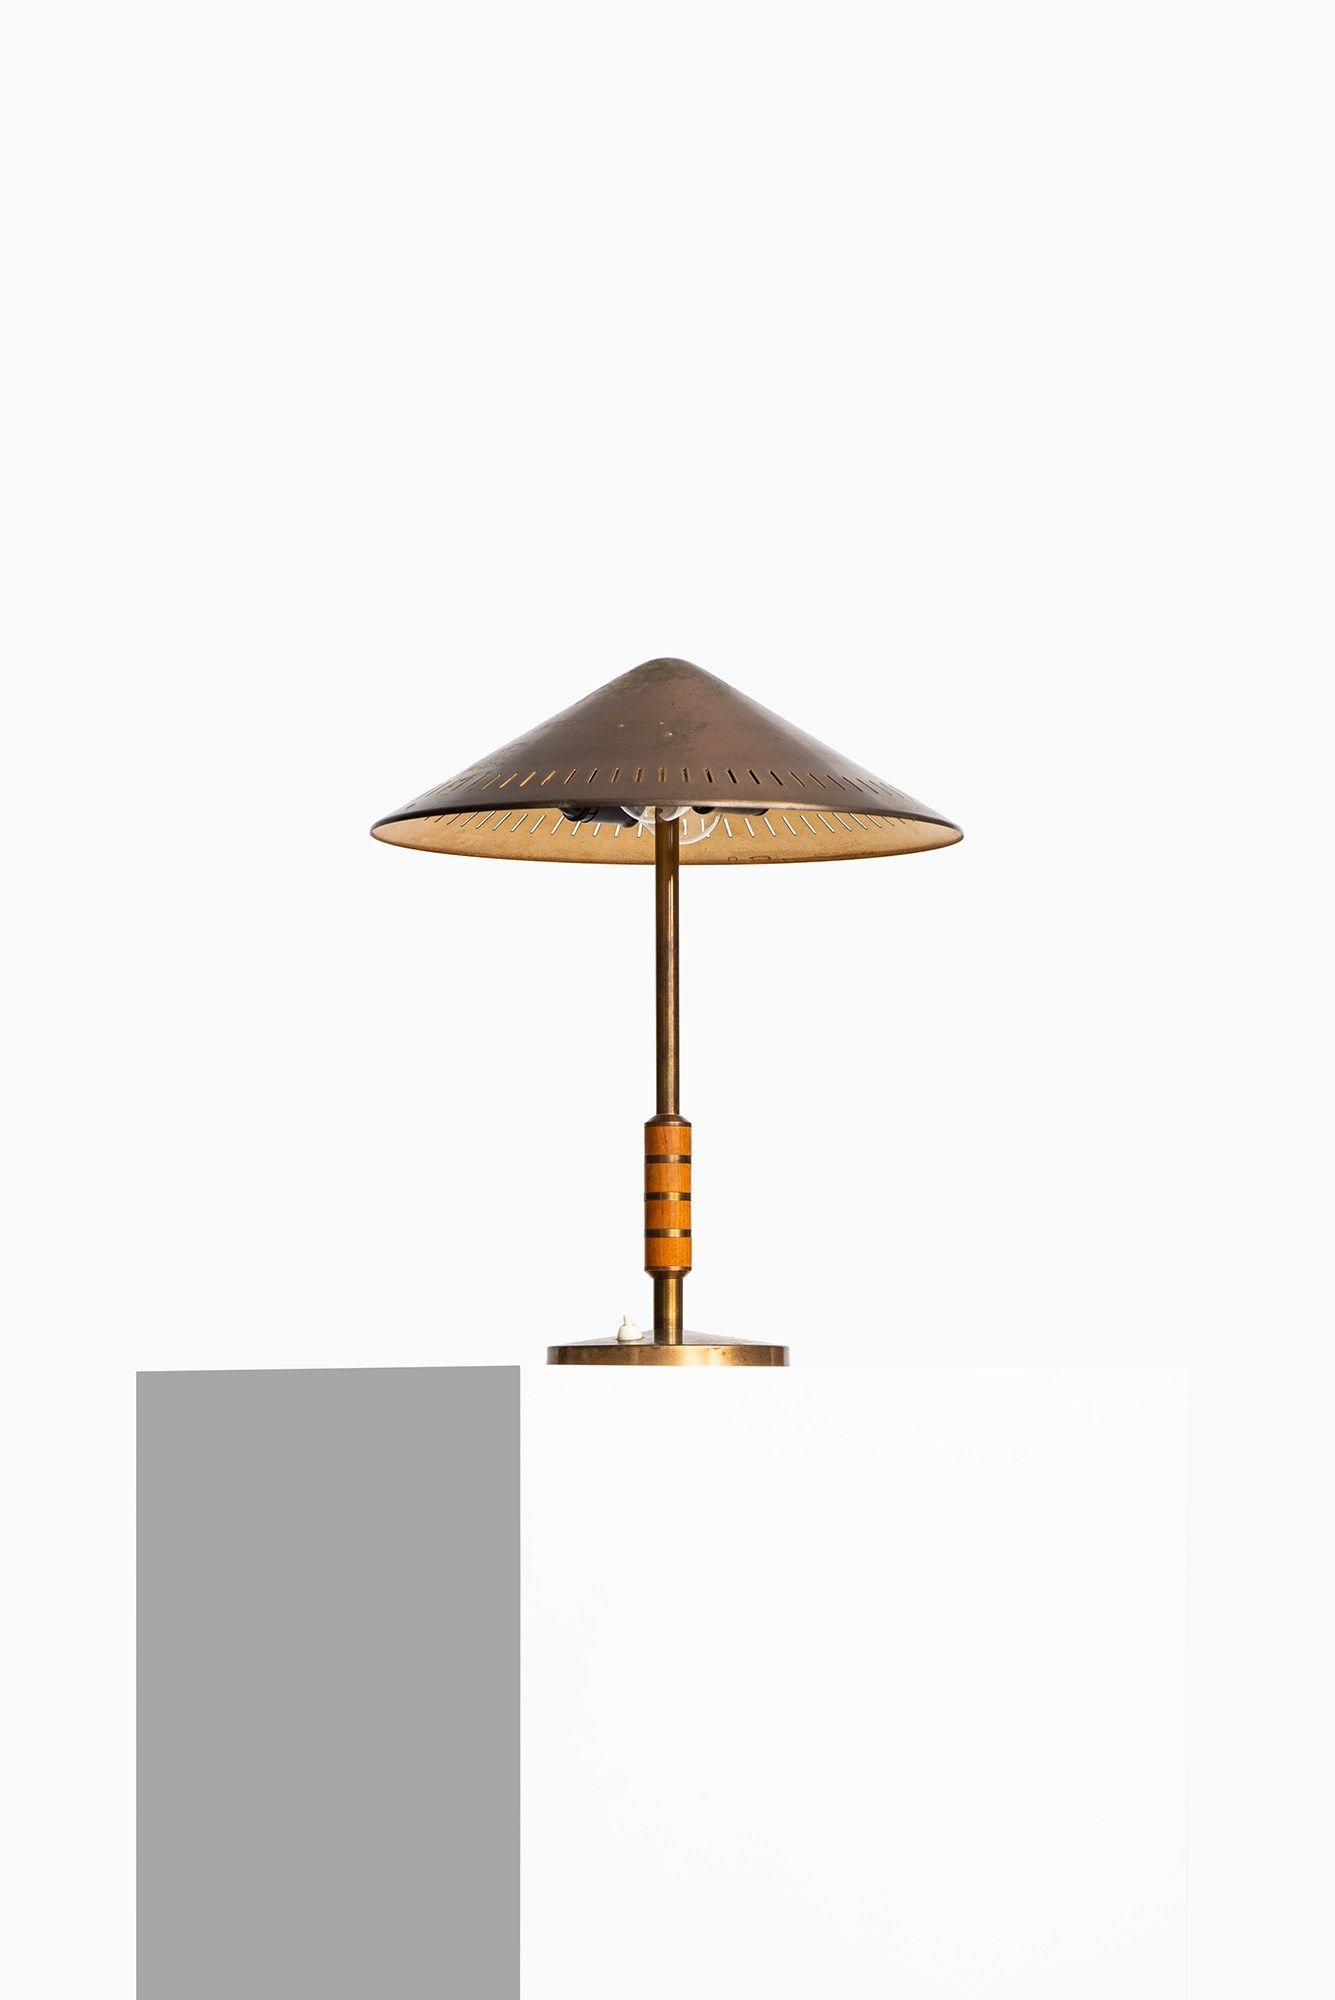 Bent Karlby Table Lamp Studio Schalling Lamp Table Lamp Table